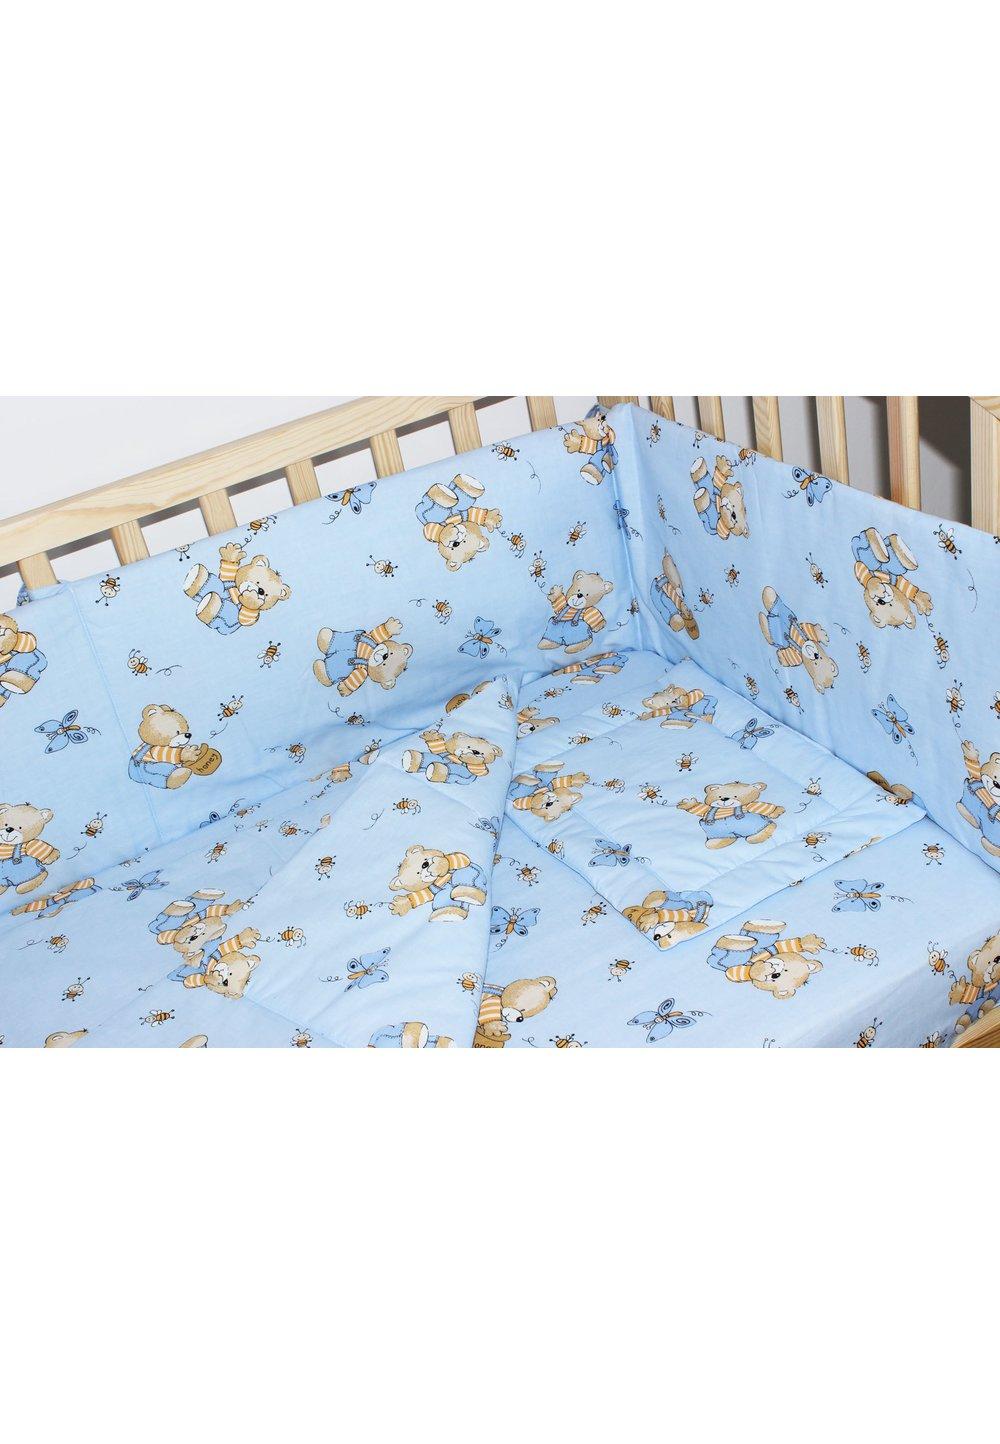 Lenjerie ursulet cu albinute albastre,3 piese imagine